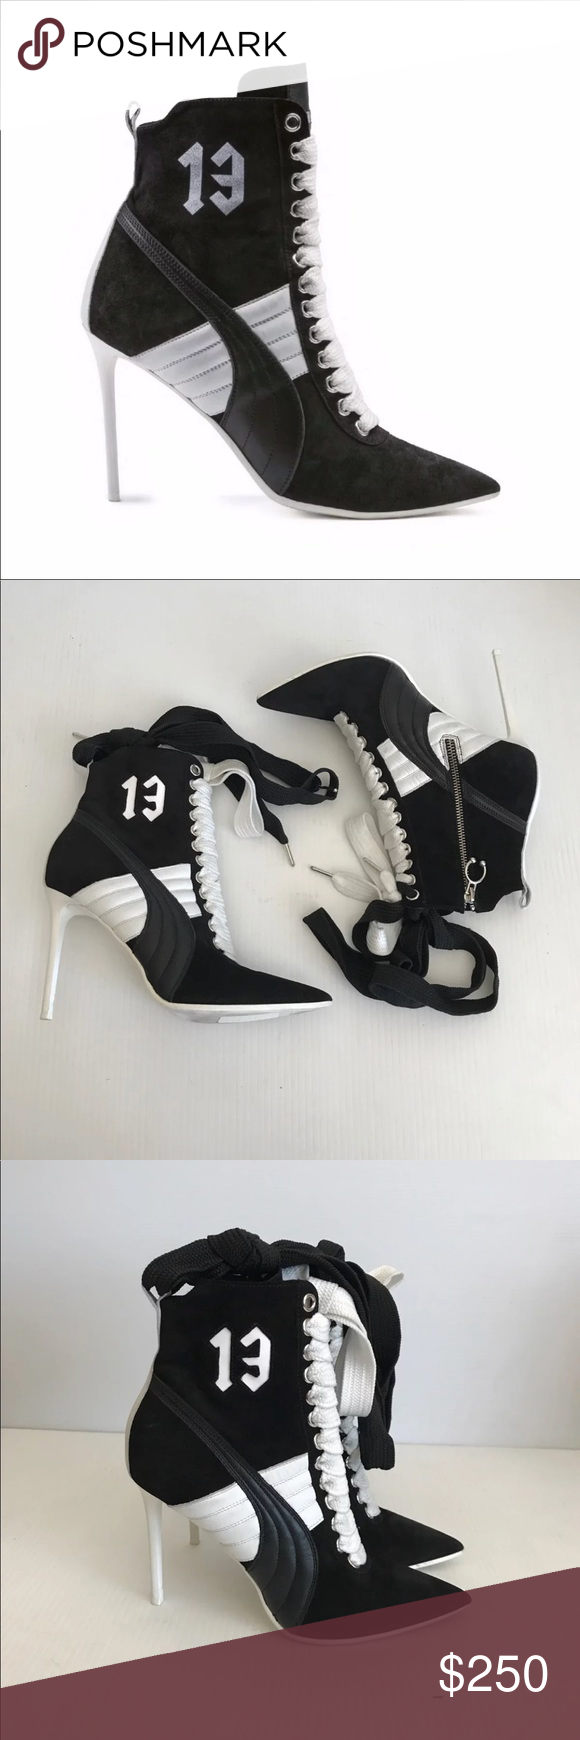 6367bfd33eaaa1 Fenty Puma Rihanna Stiletto Sneaker Boot Pump Fenty PUMA by Rihanna Rihanna  Suede Pointed Toe High Heel Boot Style   363706 01 Blac…